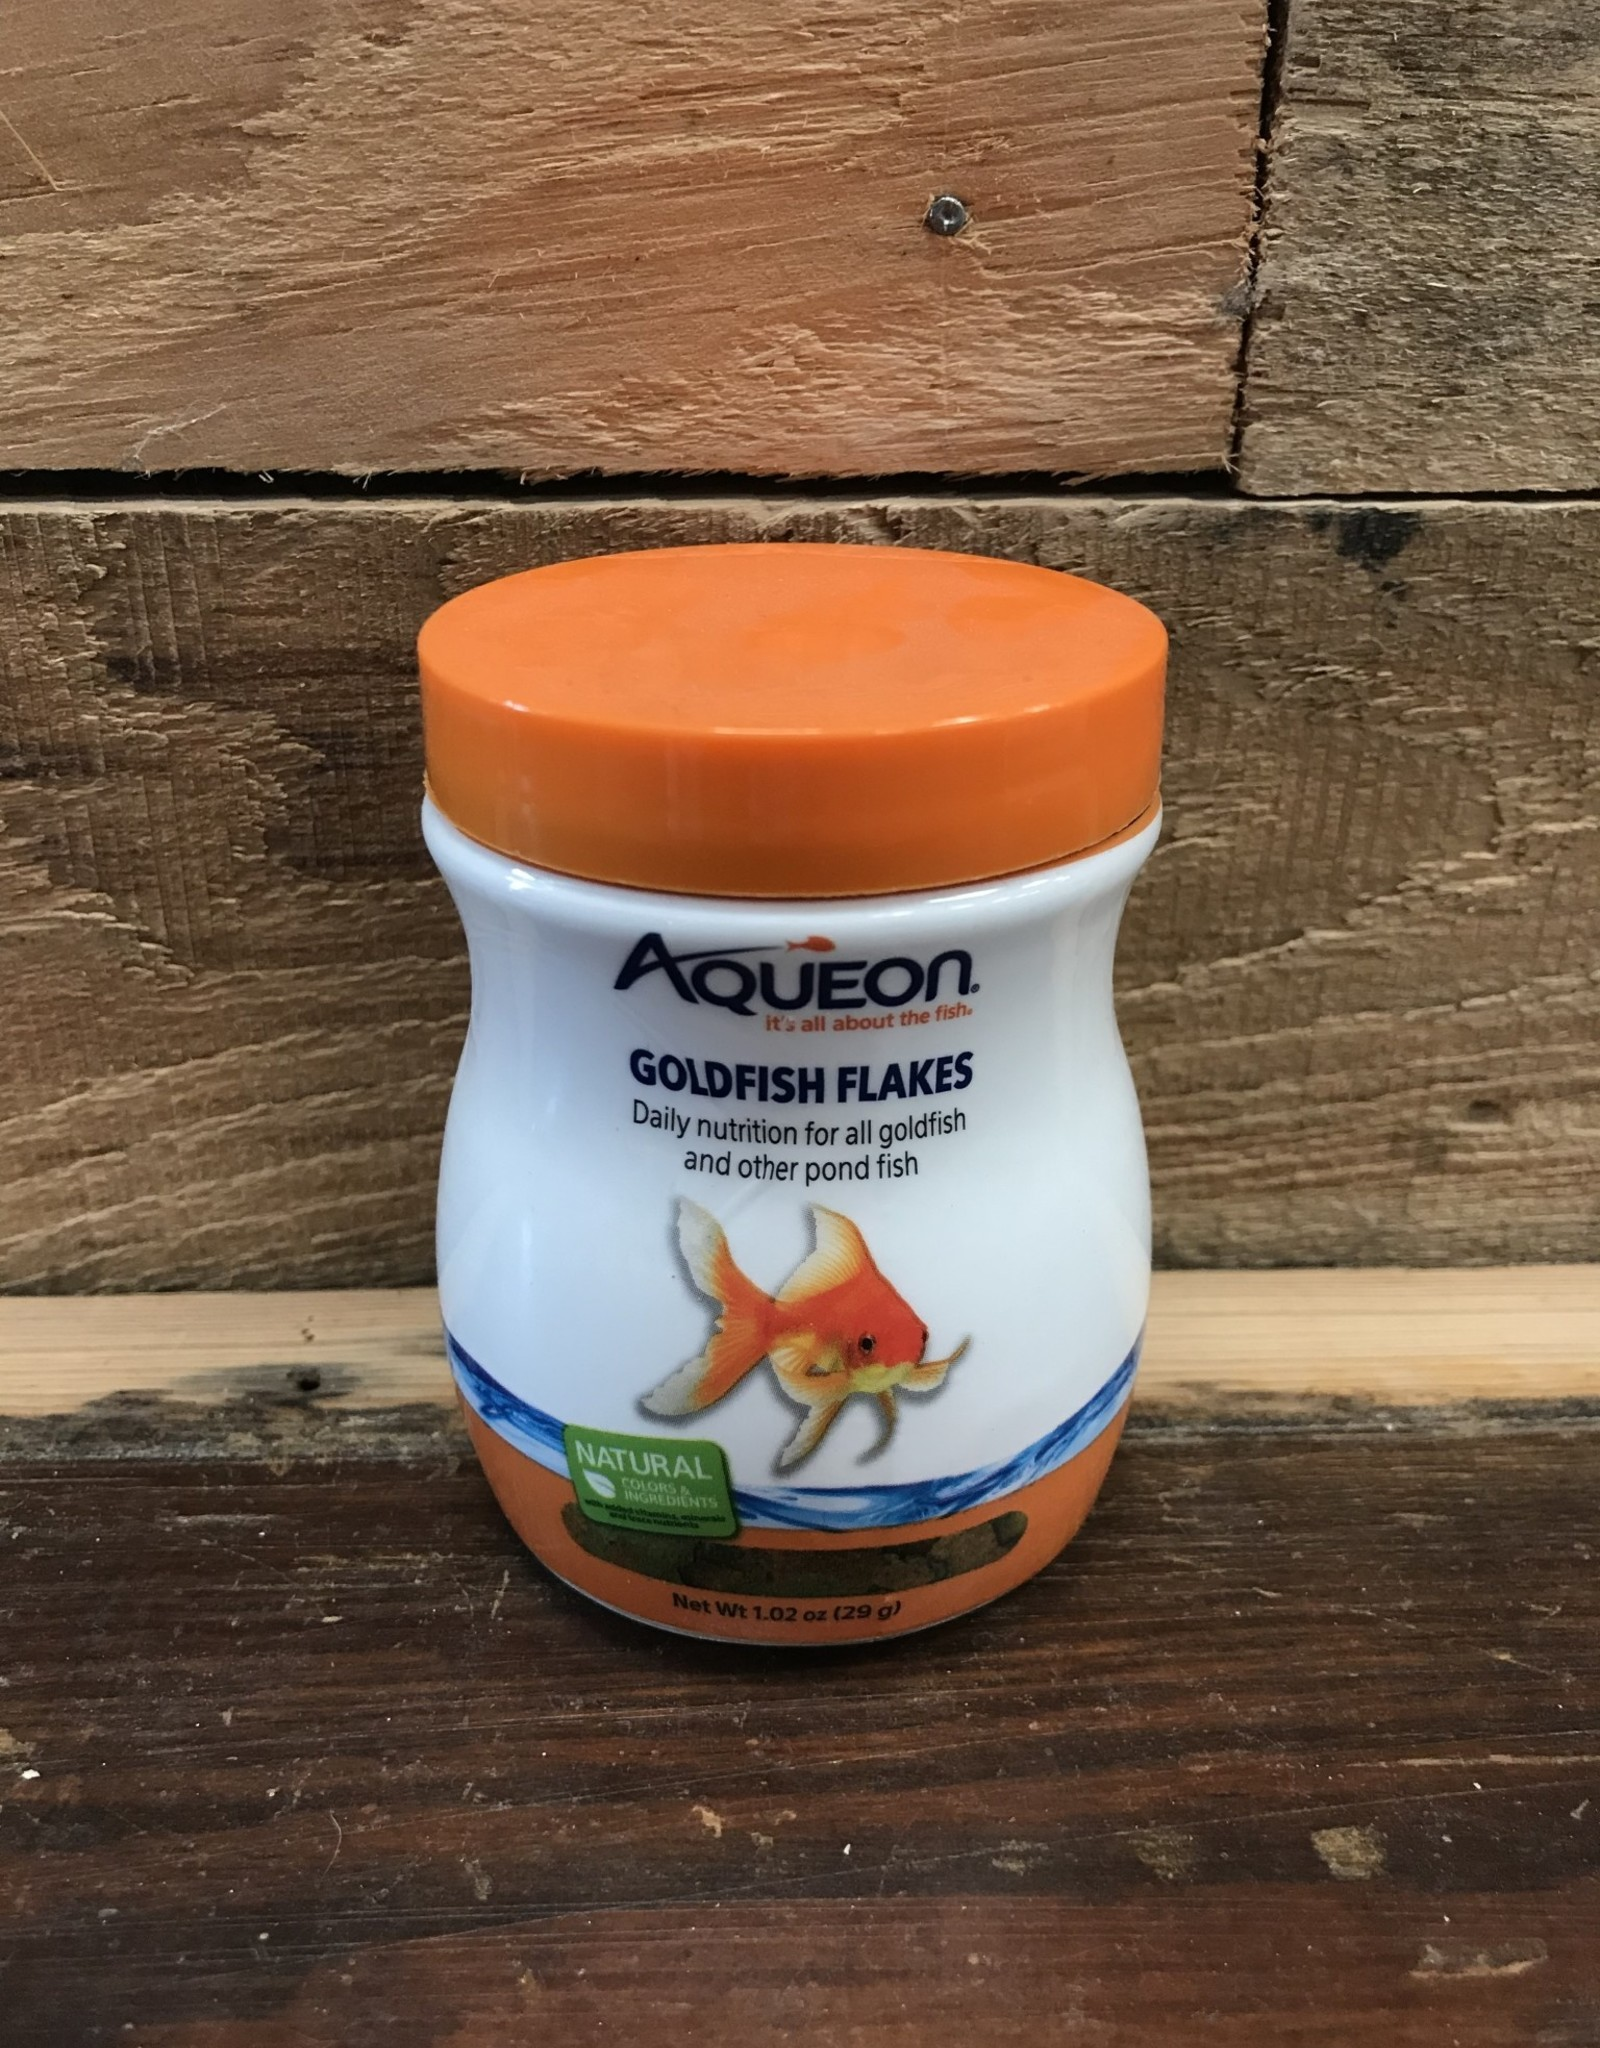 Aqueon Aqueon GOLDFISH FLAKE 1.02oz